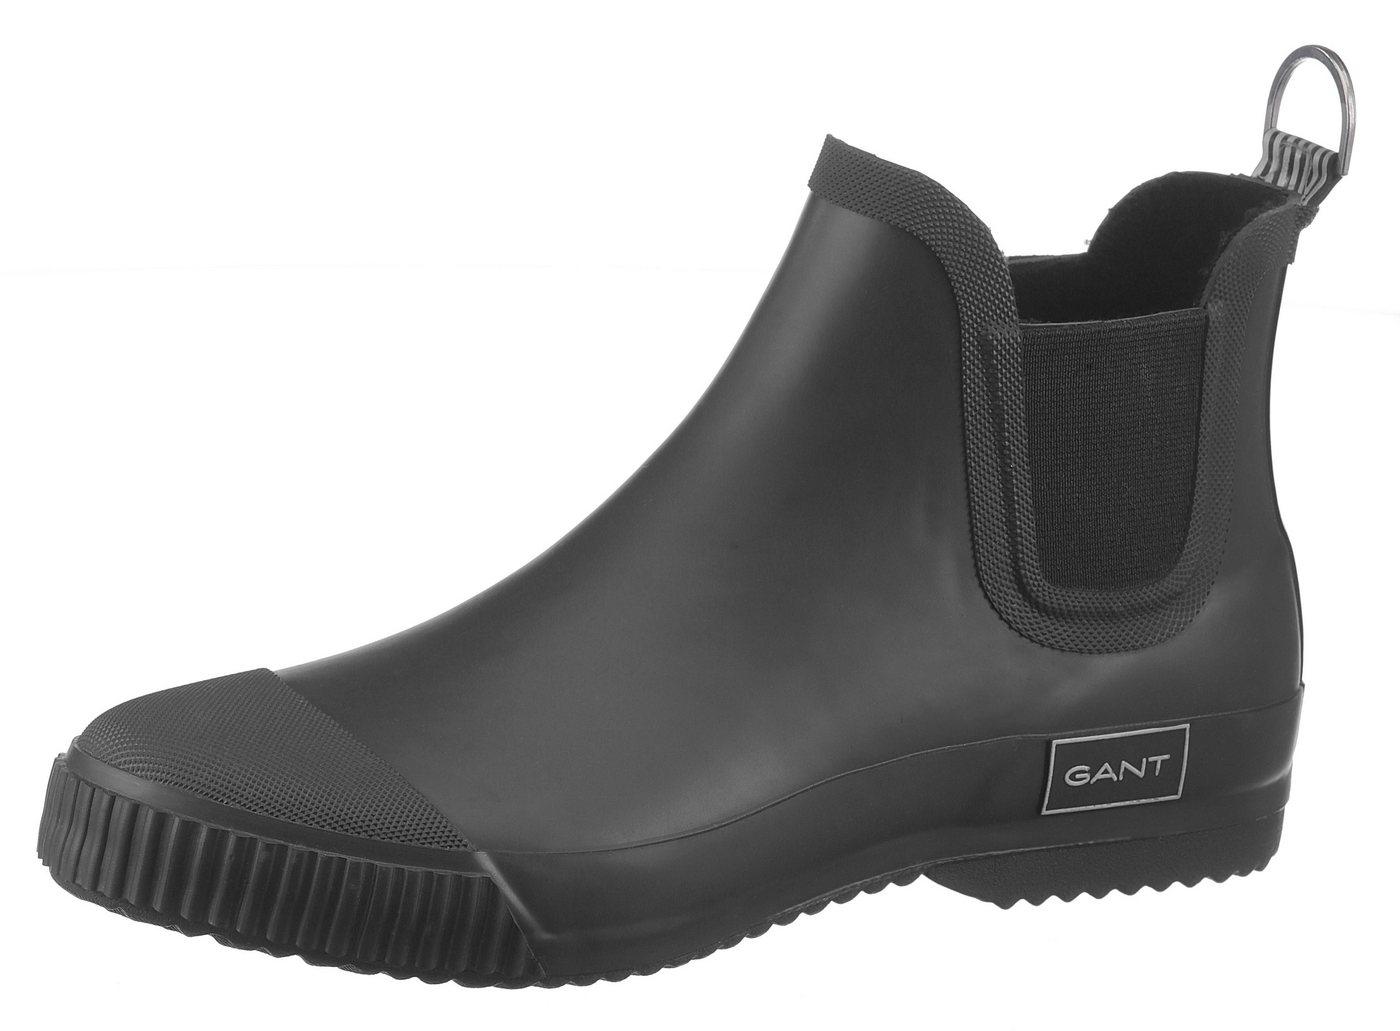 Gant Footwear »Mandy« Gummistiefel in toller Farbpalette | Schuhe > Gummistiefel | Schwarz | Gant Footwear